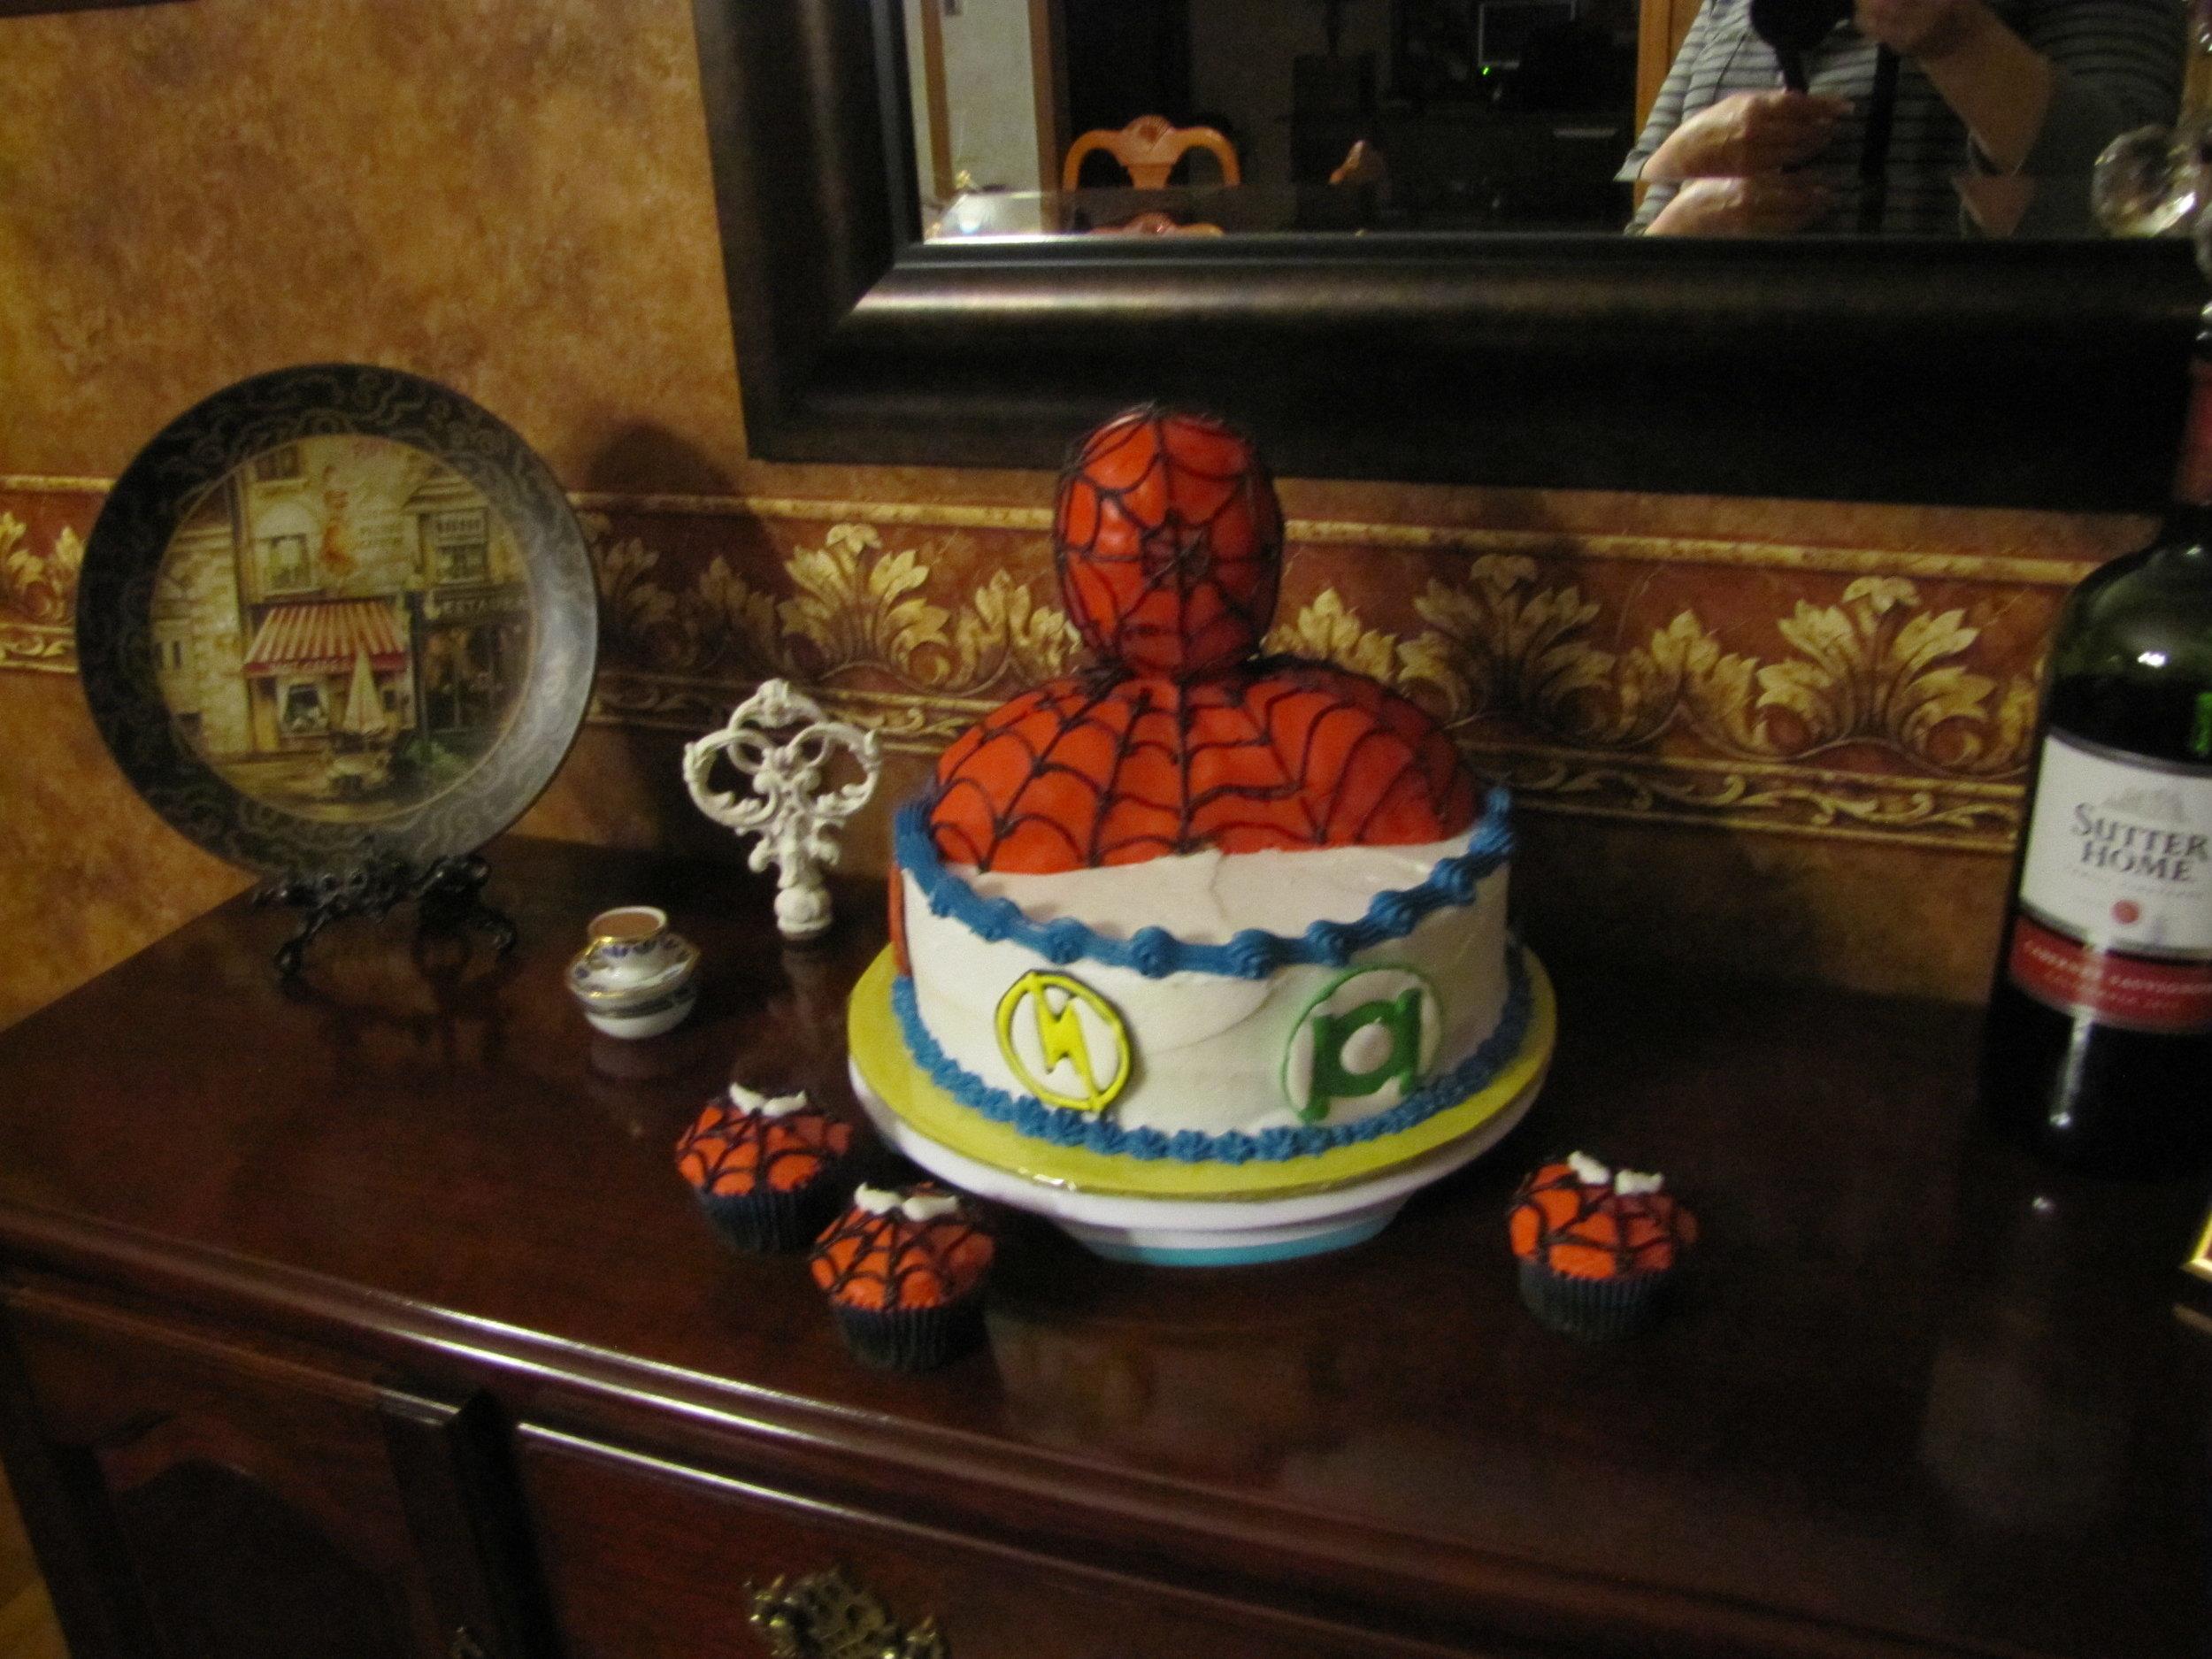 super hero 3 cake.JPG